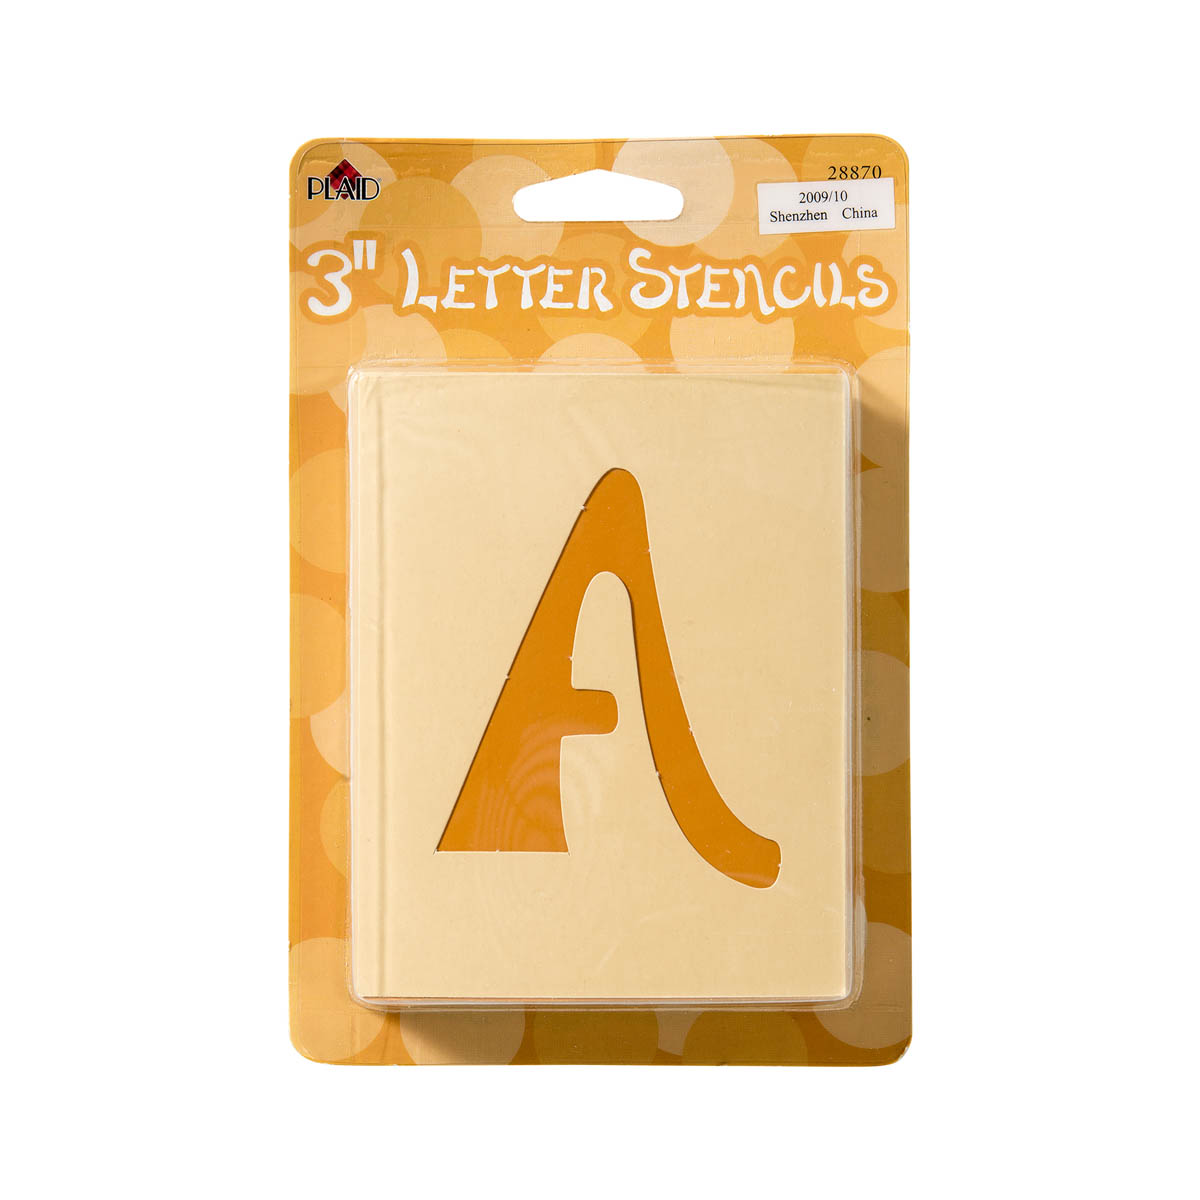 Plaid ® Stencils - Value Packs - Letter Stencils - Swashbuckle